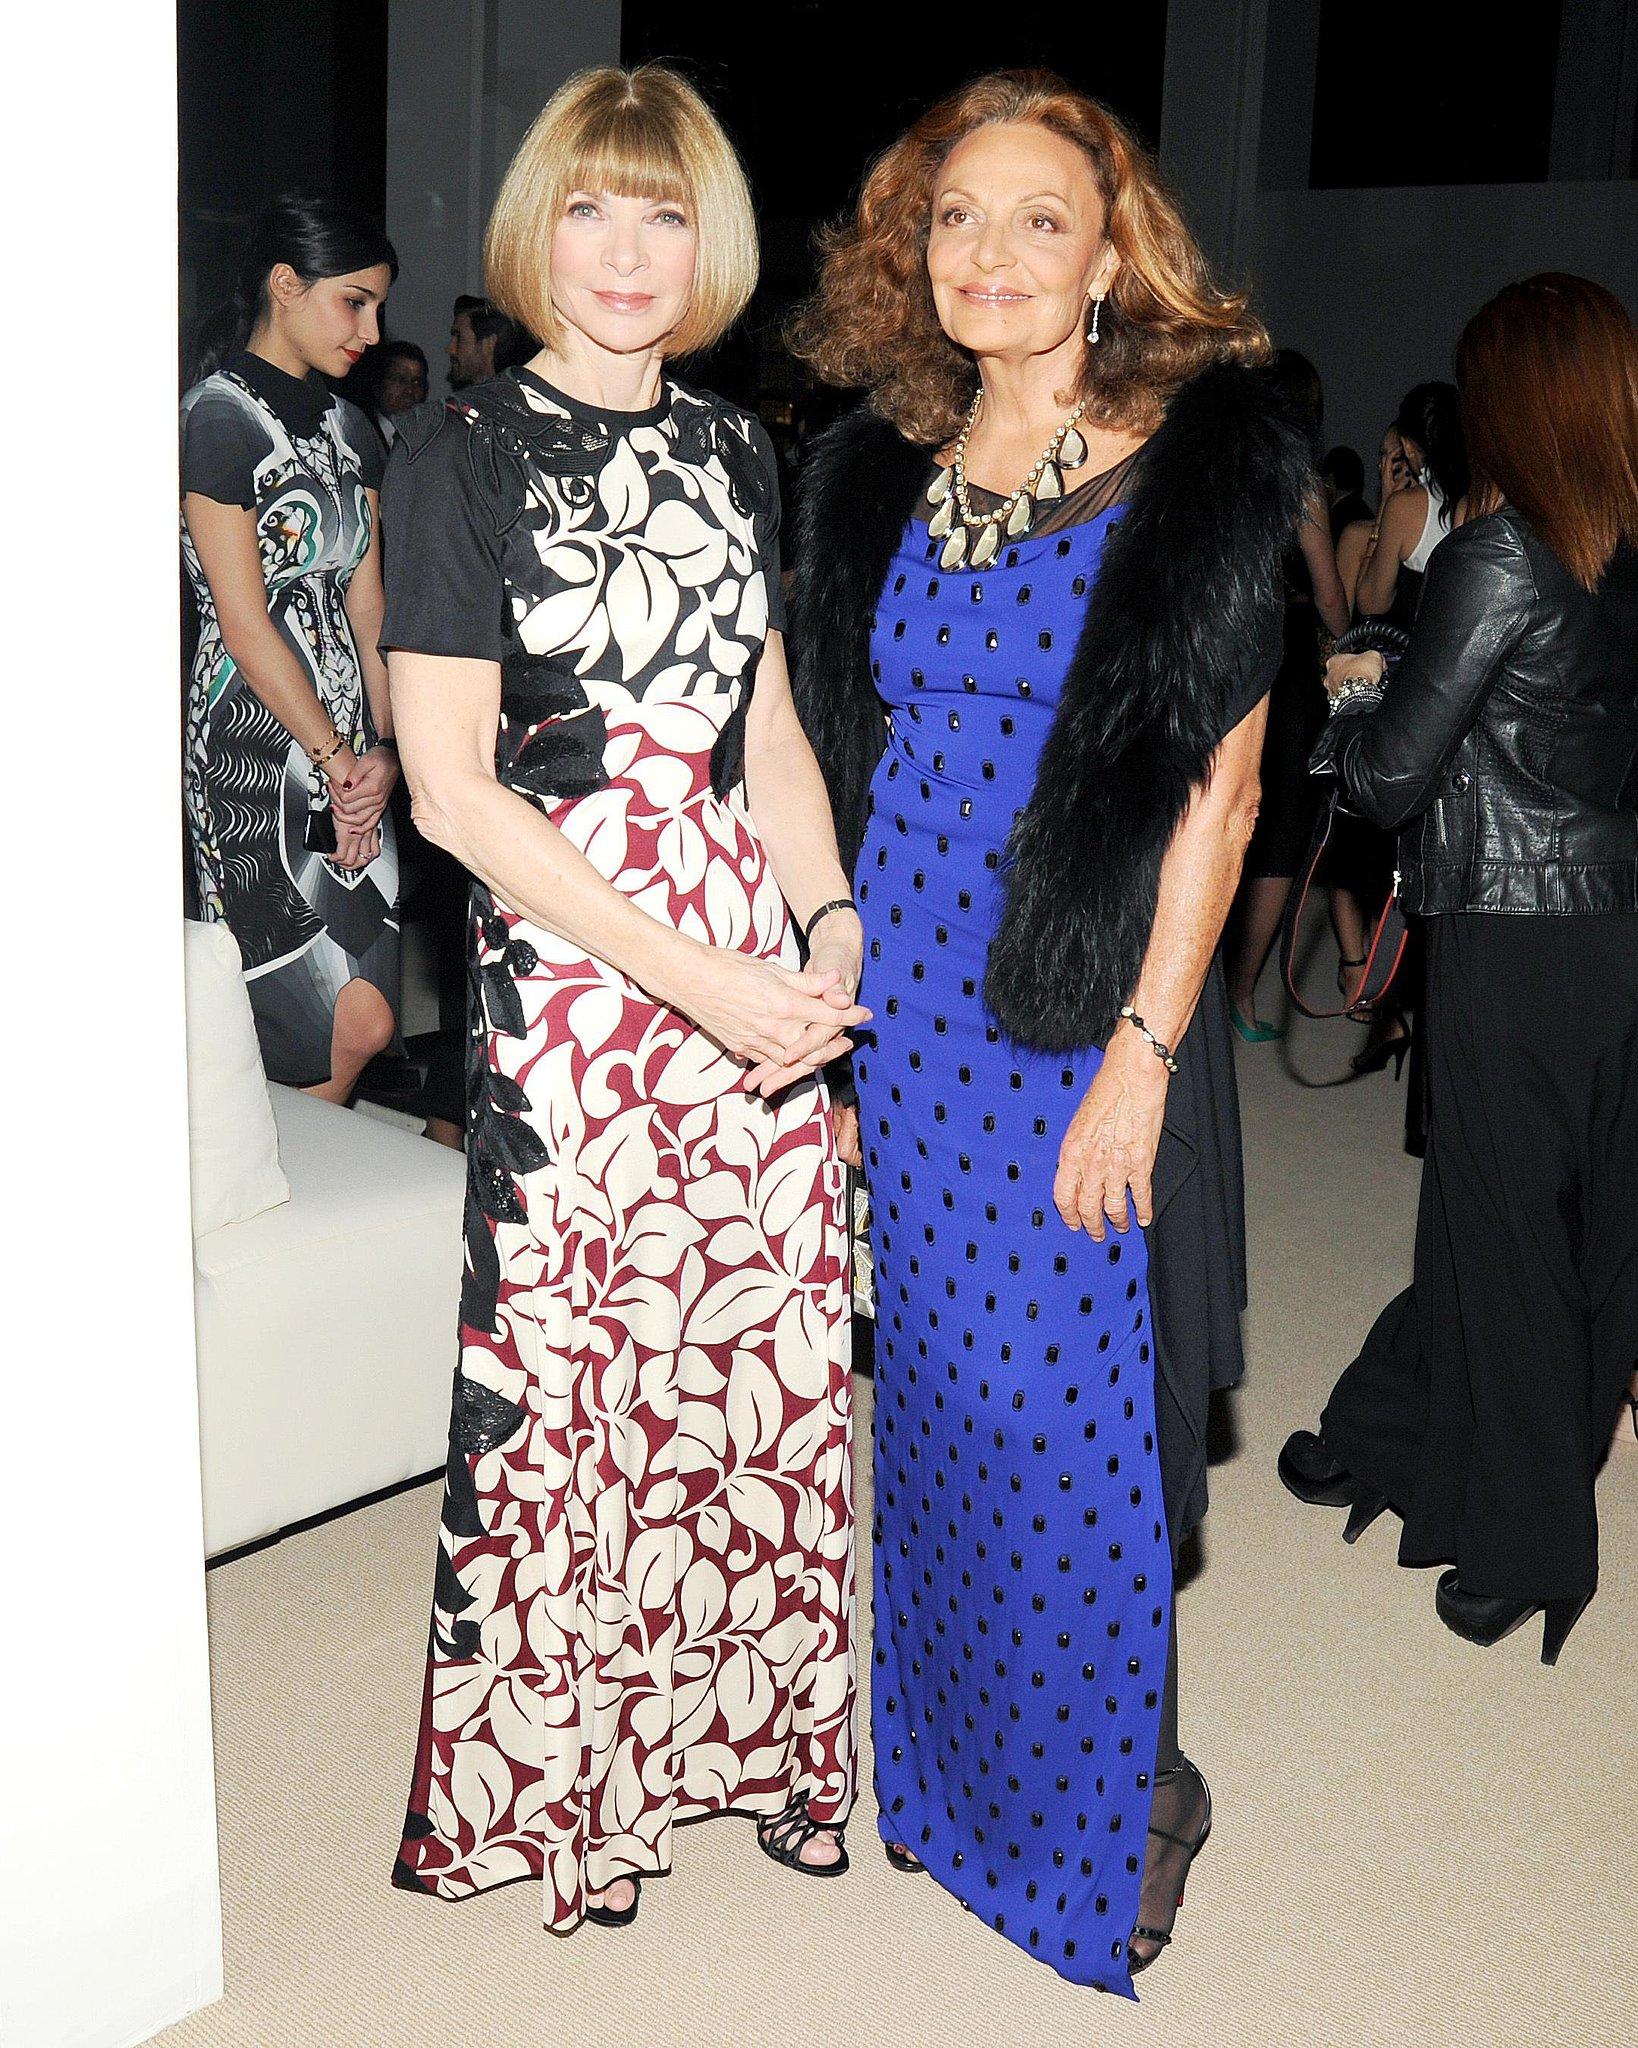 Anna Wintour and CFDA president Diane von Furstenberg at the event.